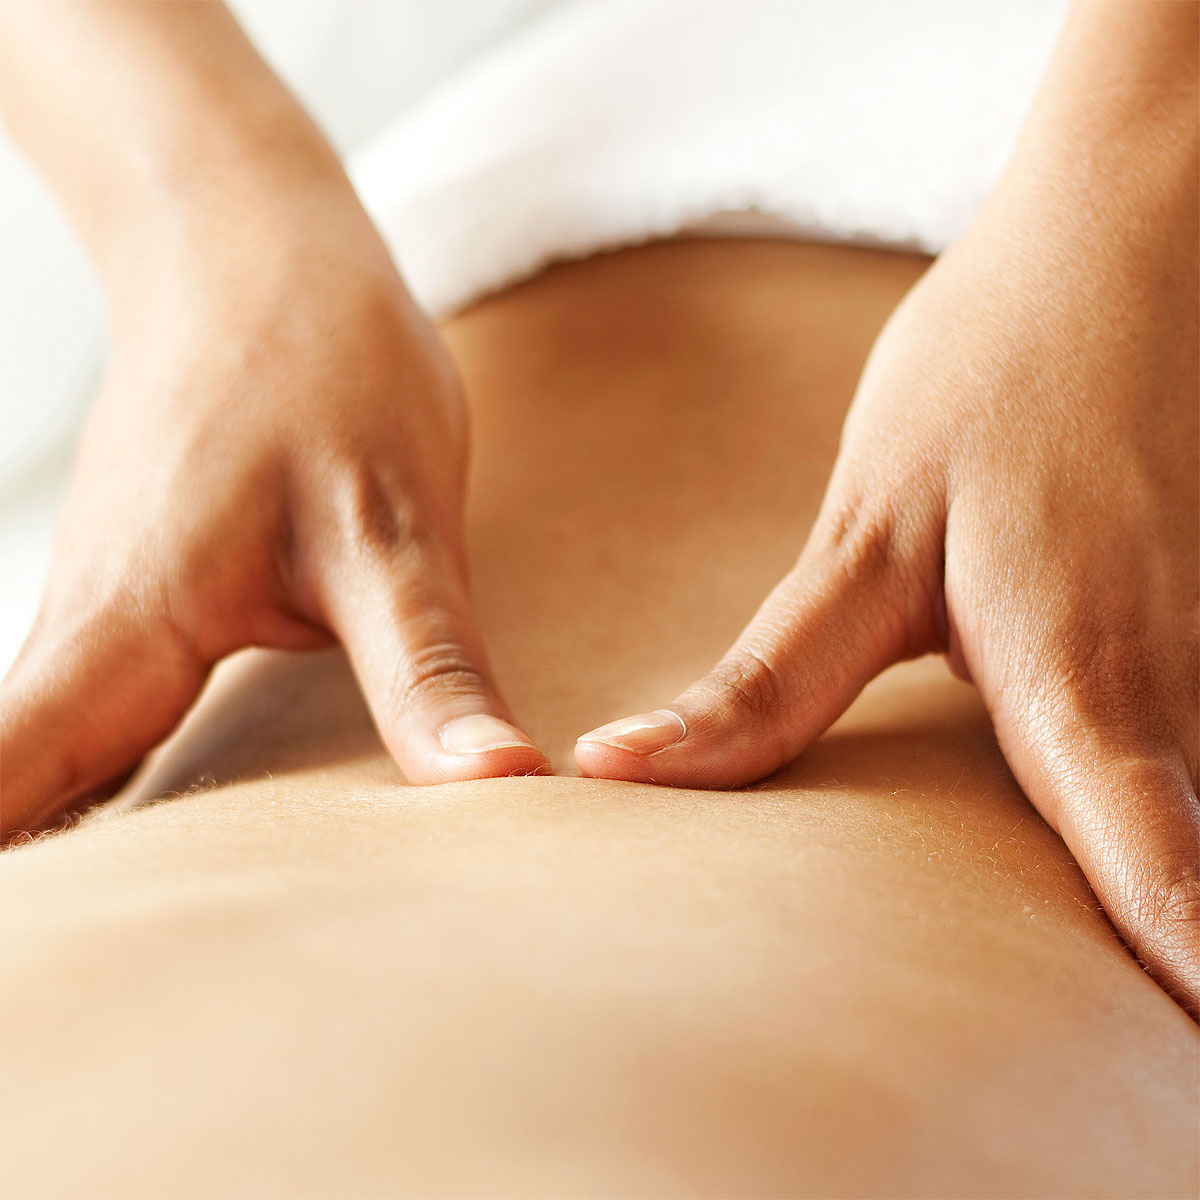 Image result for Deep Tissue Massage Istock